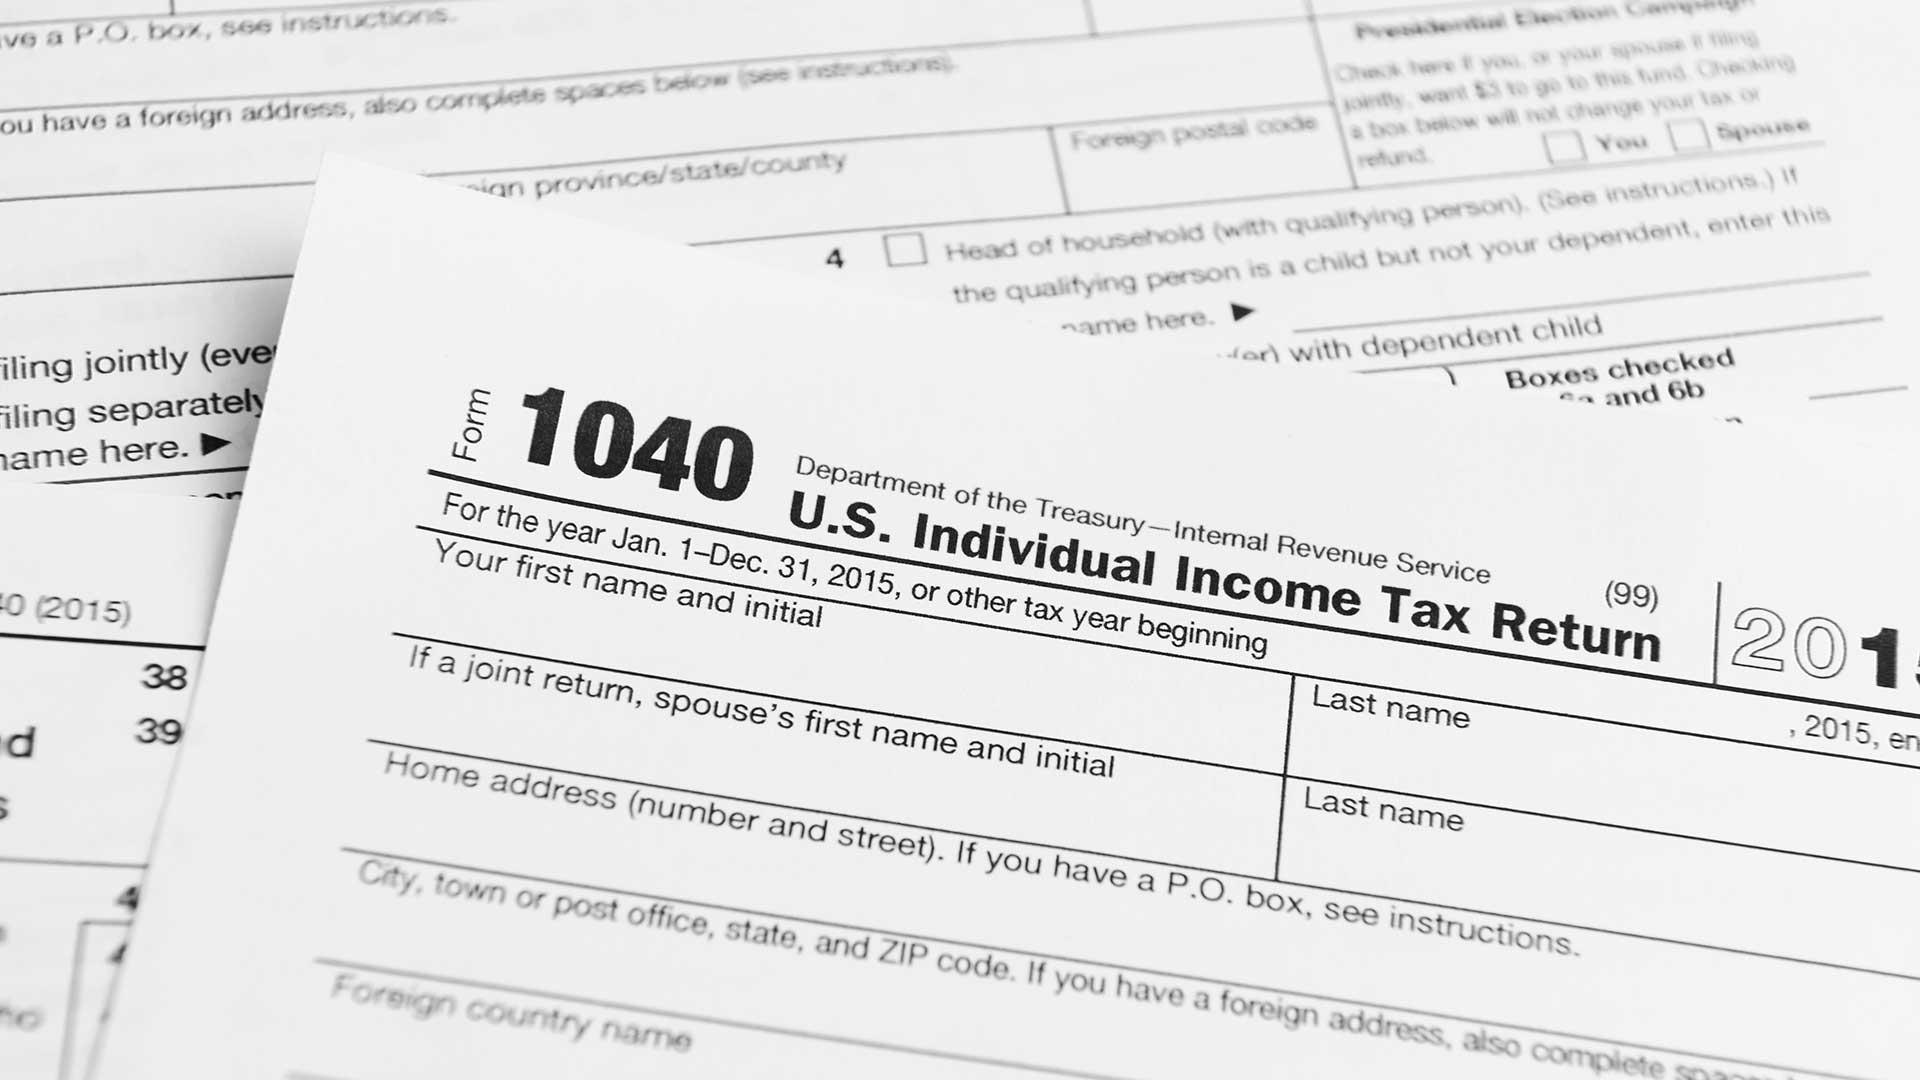 IRS-1040.jpg